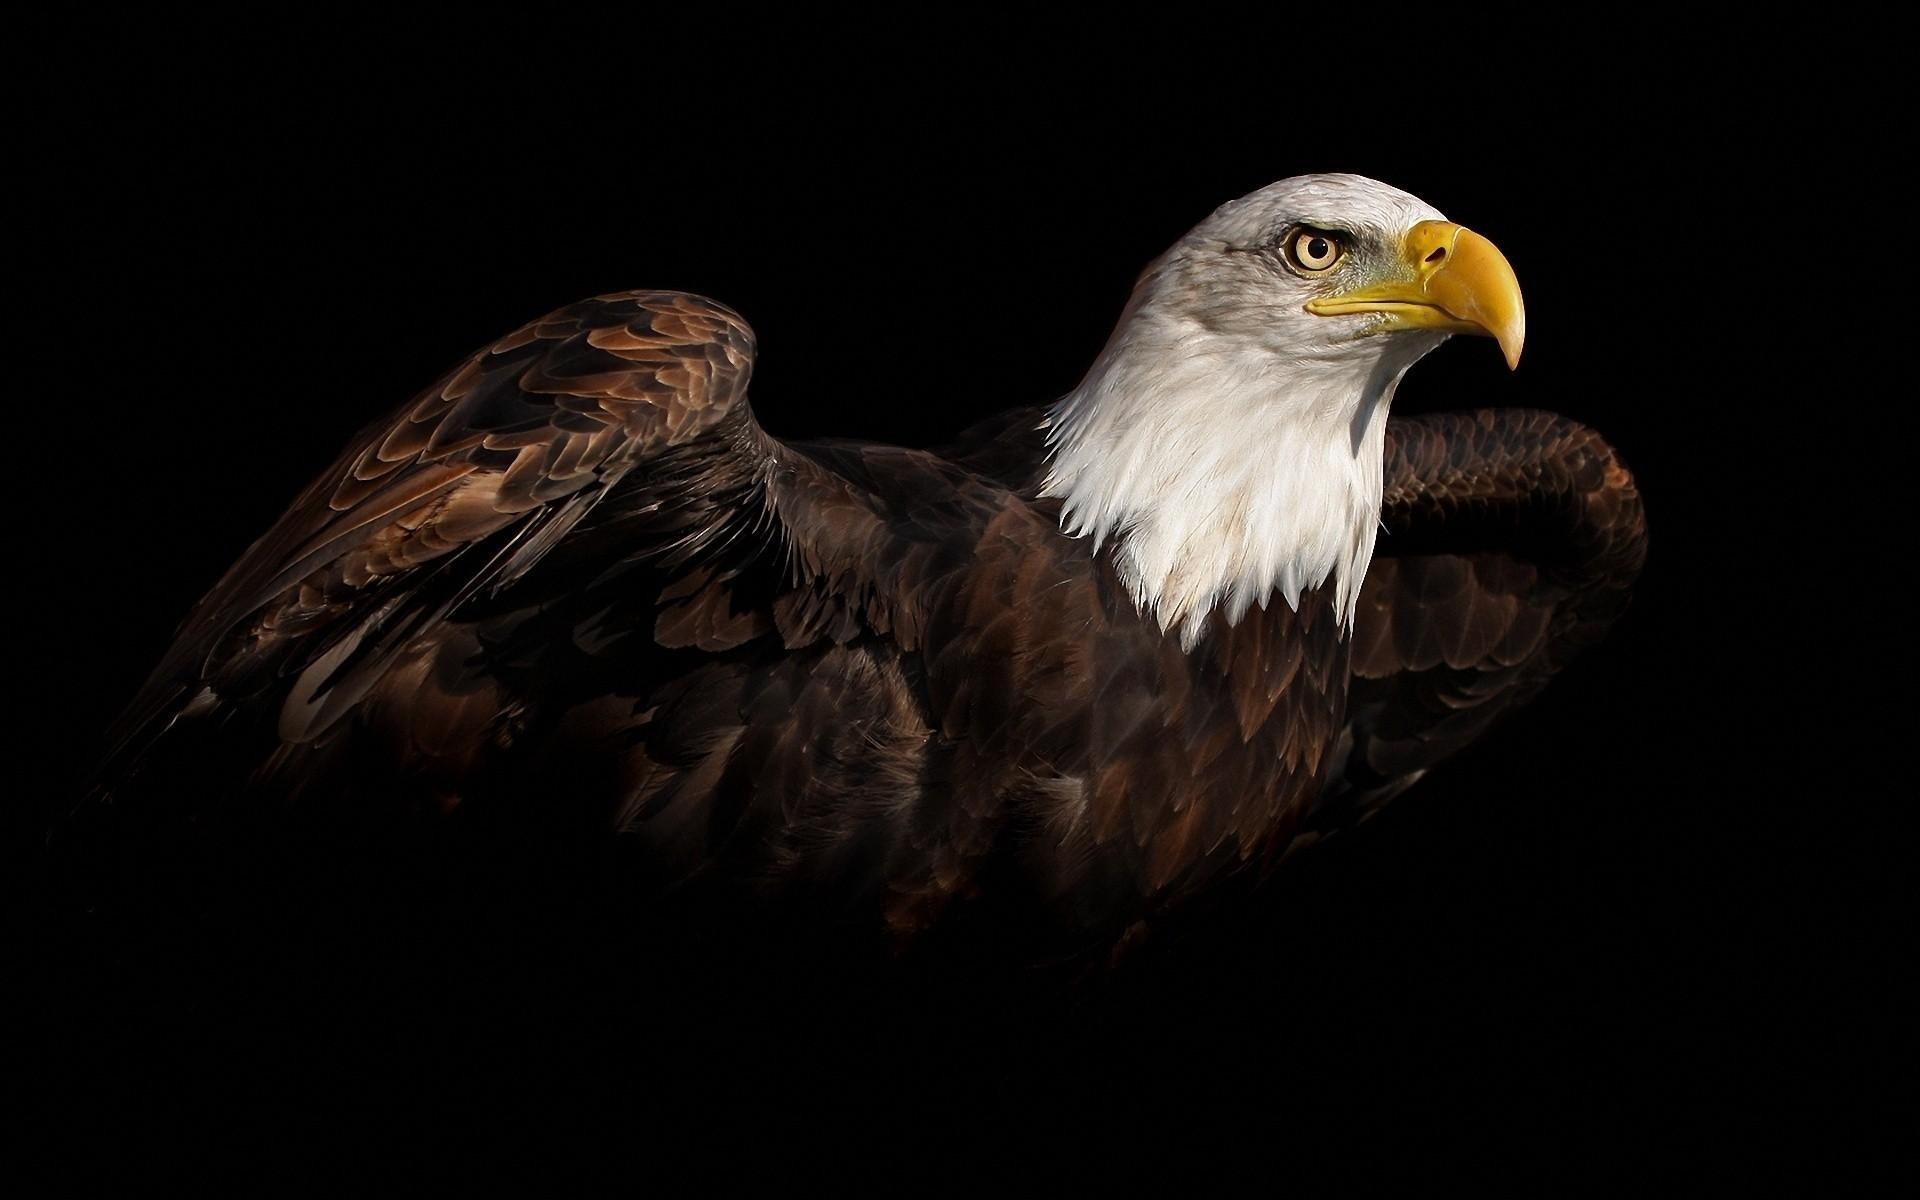 free eagle wallpaper